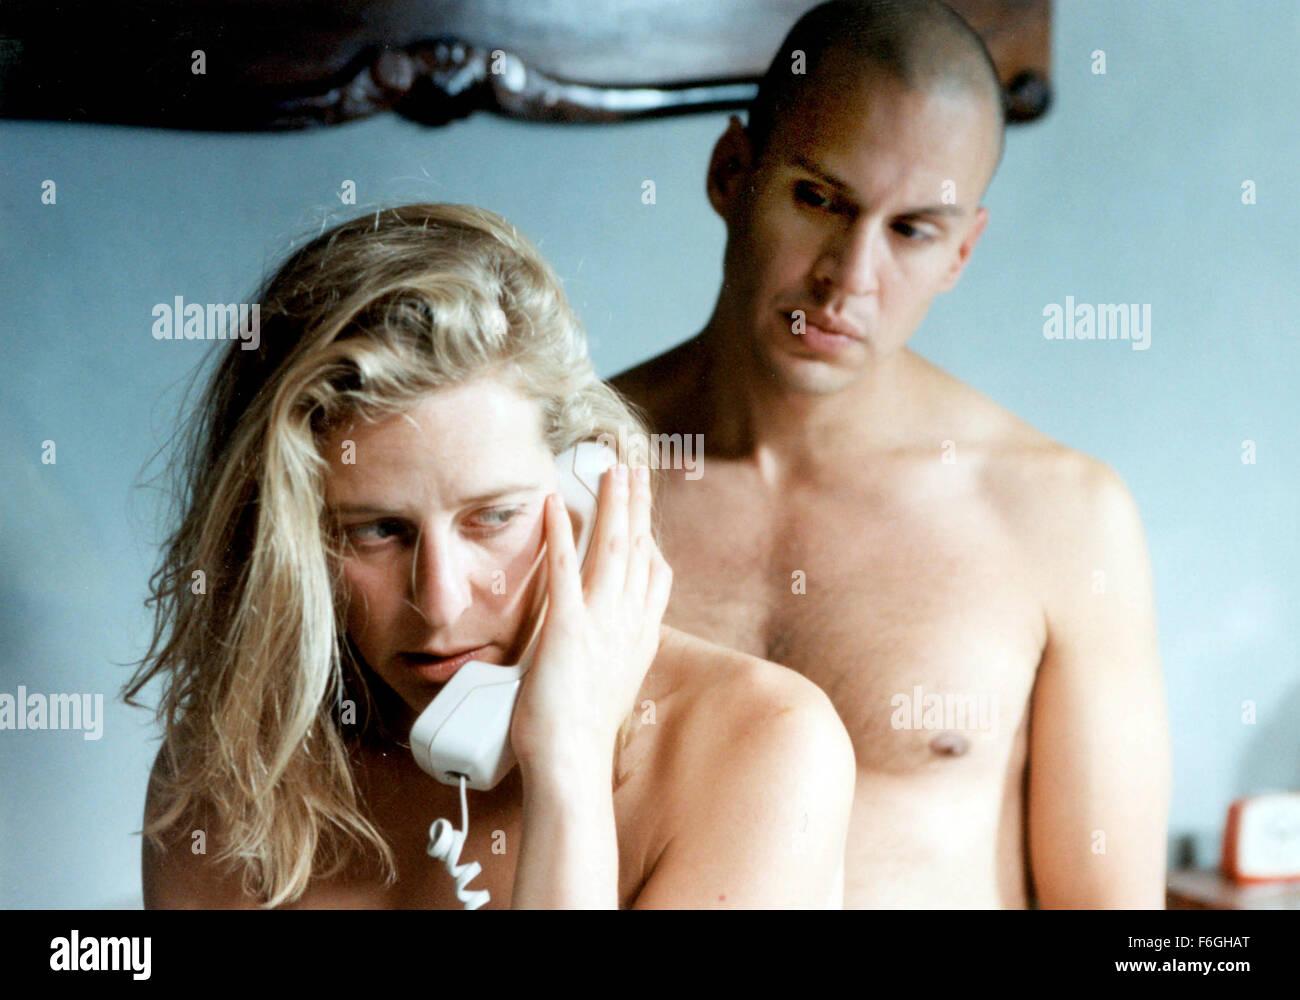 Nov 26, 1999; Jerusalem, ISRAEL; Dafna Rechter and Jonathan Sagall star in  1999 movie 'Urban Feel' directed by Jonathan Sagall